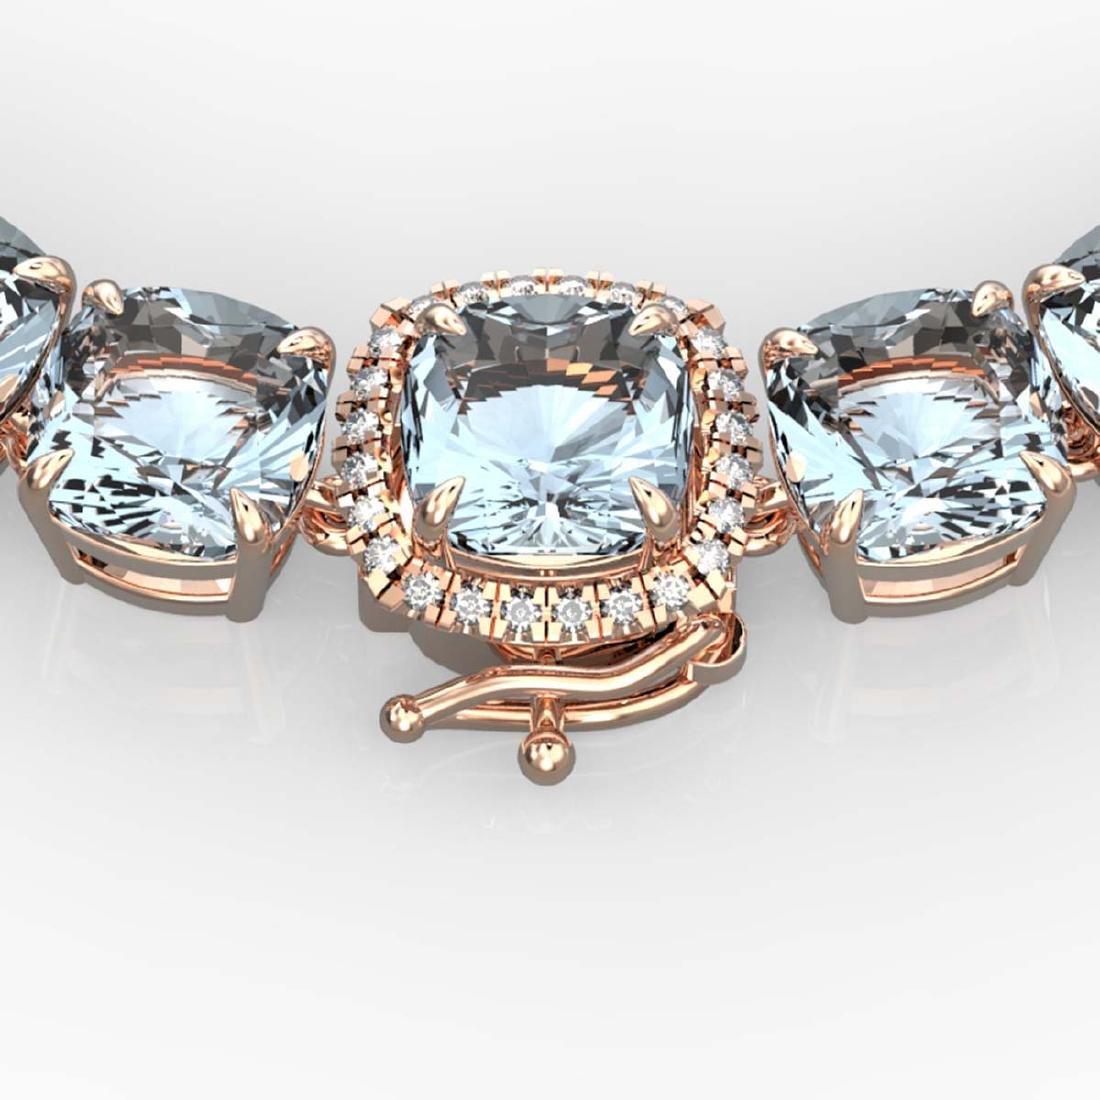 87 ctw Sky Blue Topaz & VS/SI Diamond Necklace 14K Rose